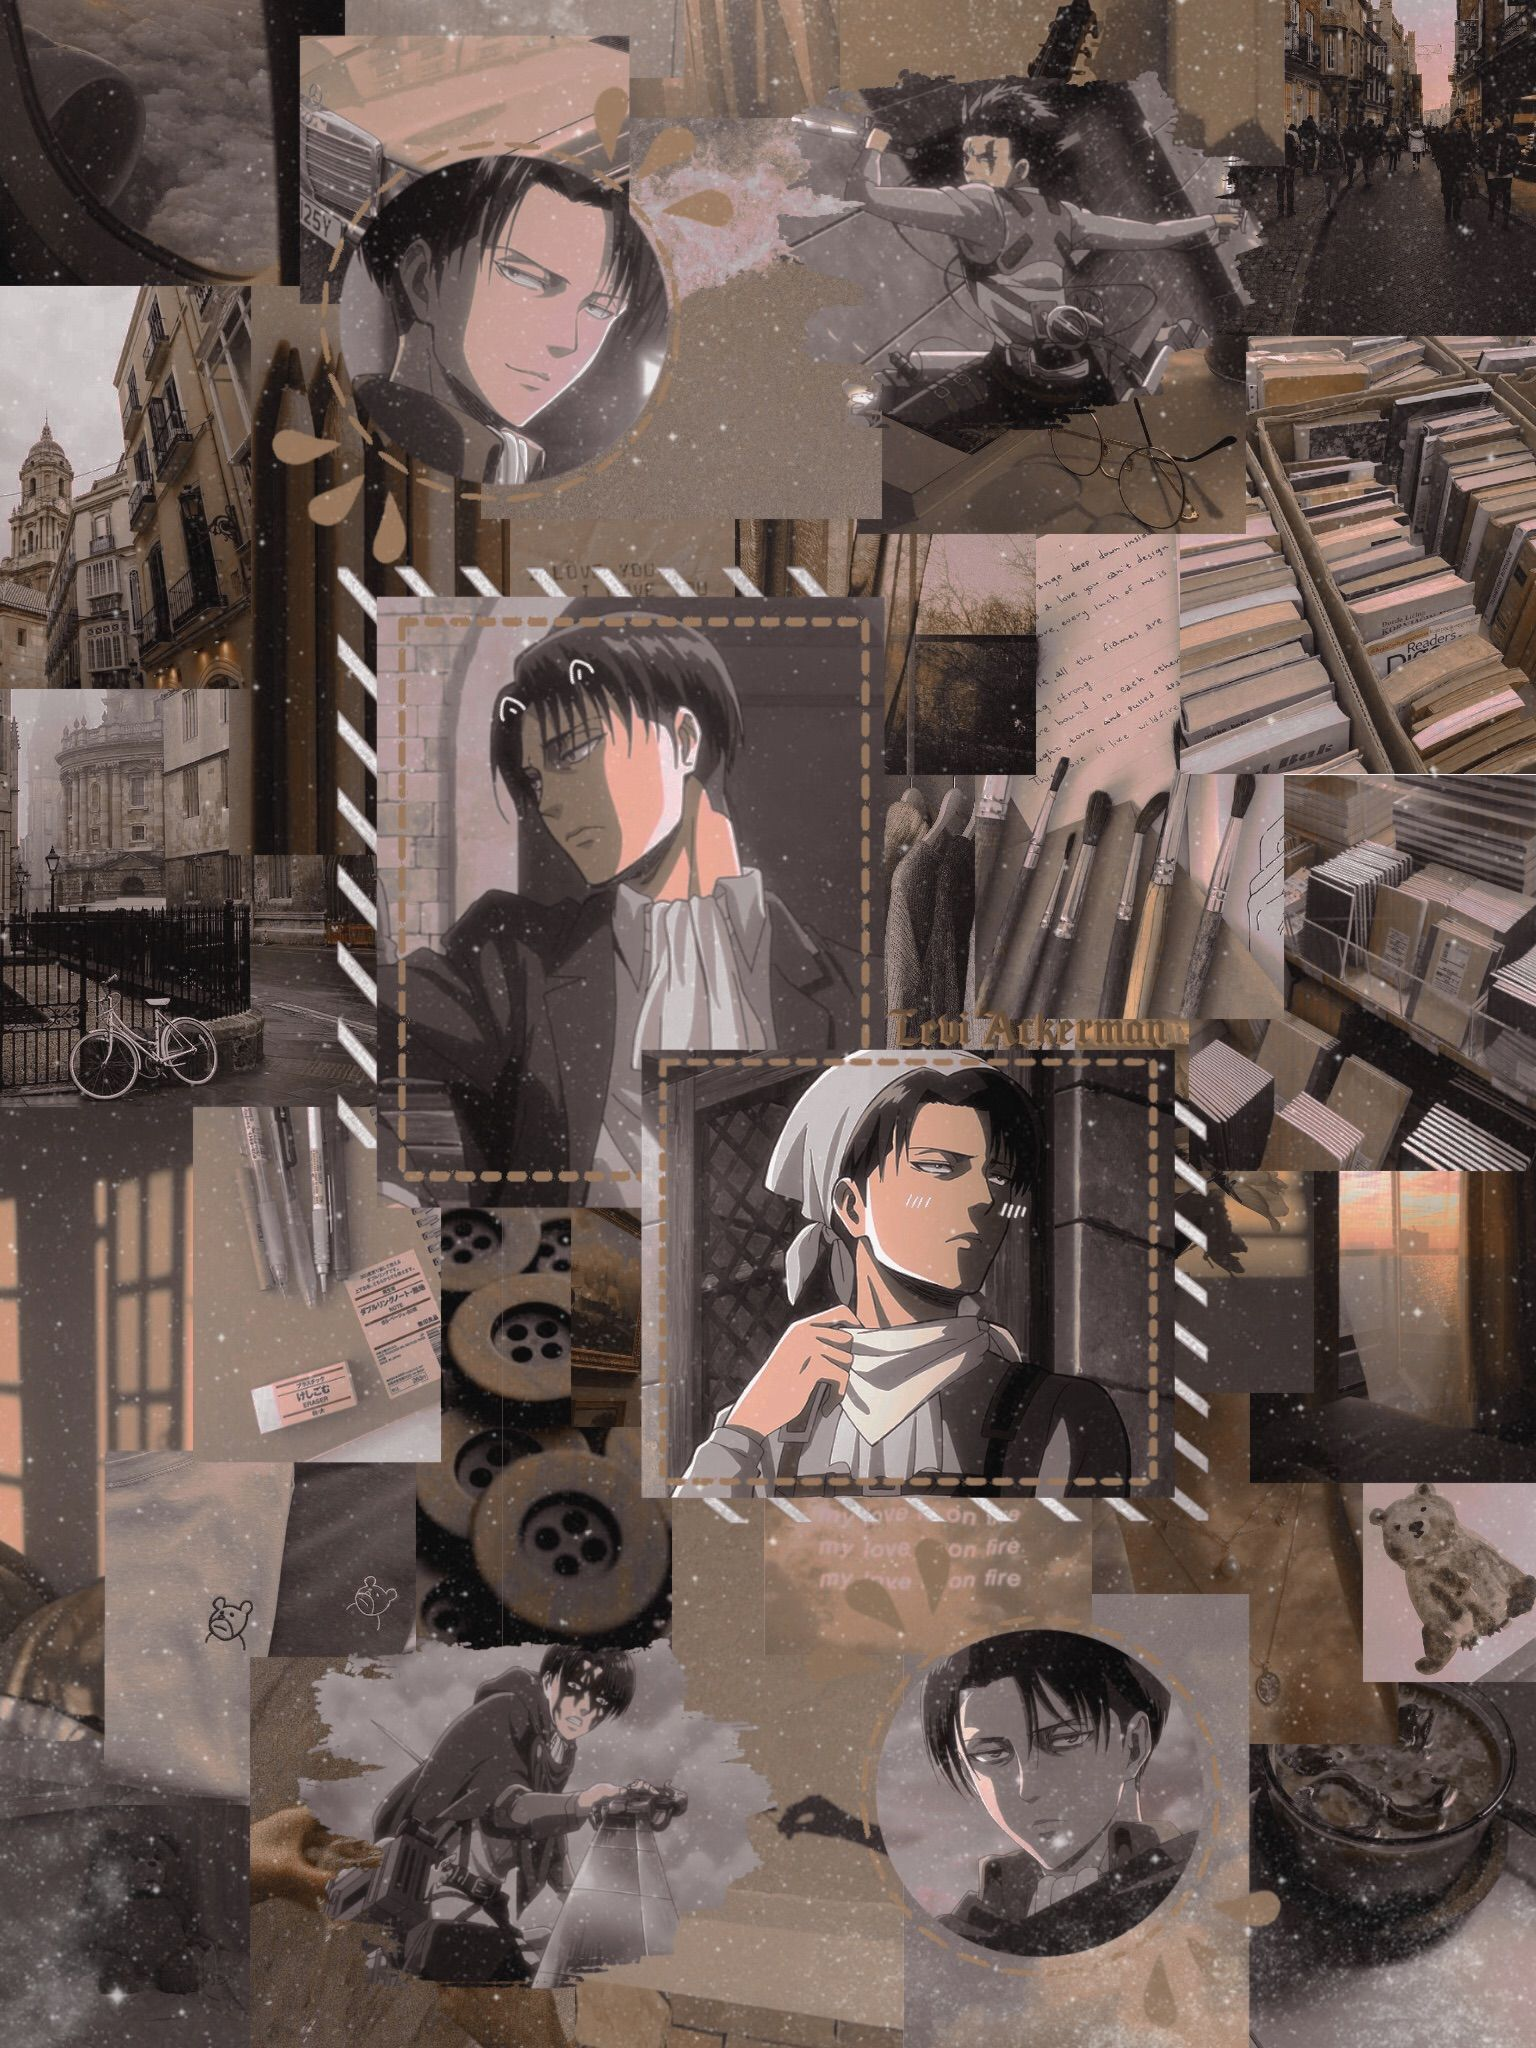 Attack On Titan Wallpaper Aesthetic